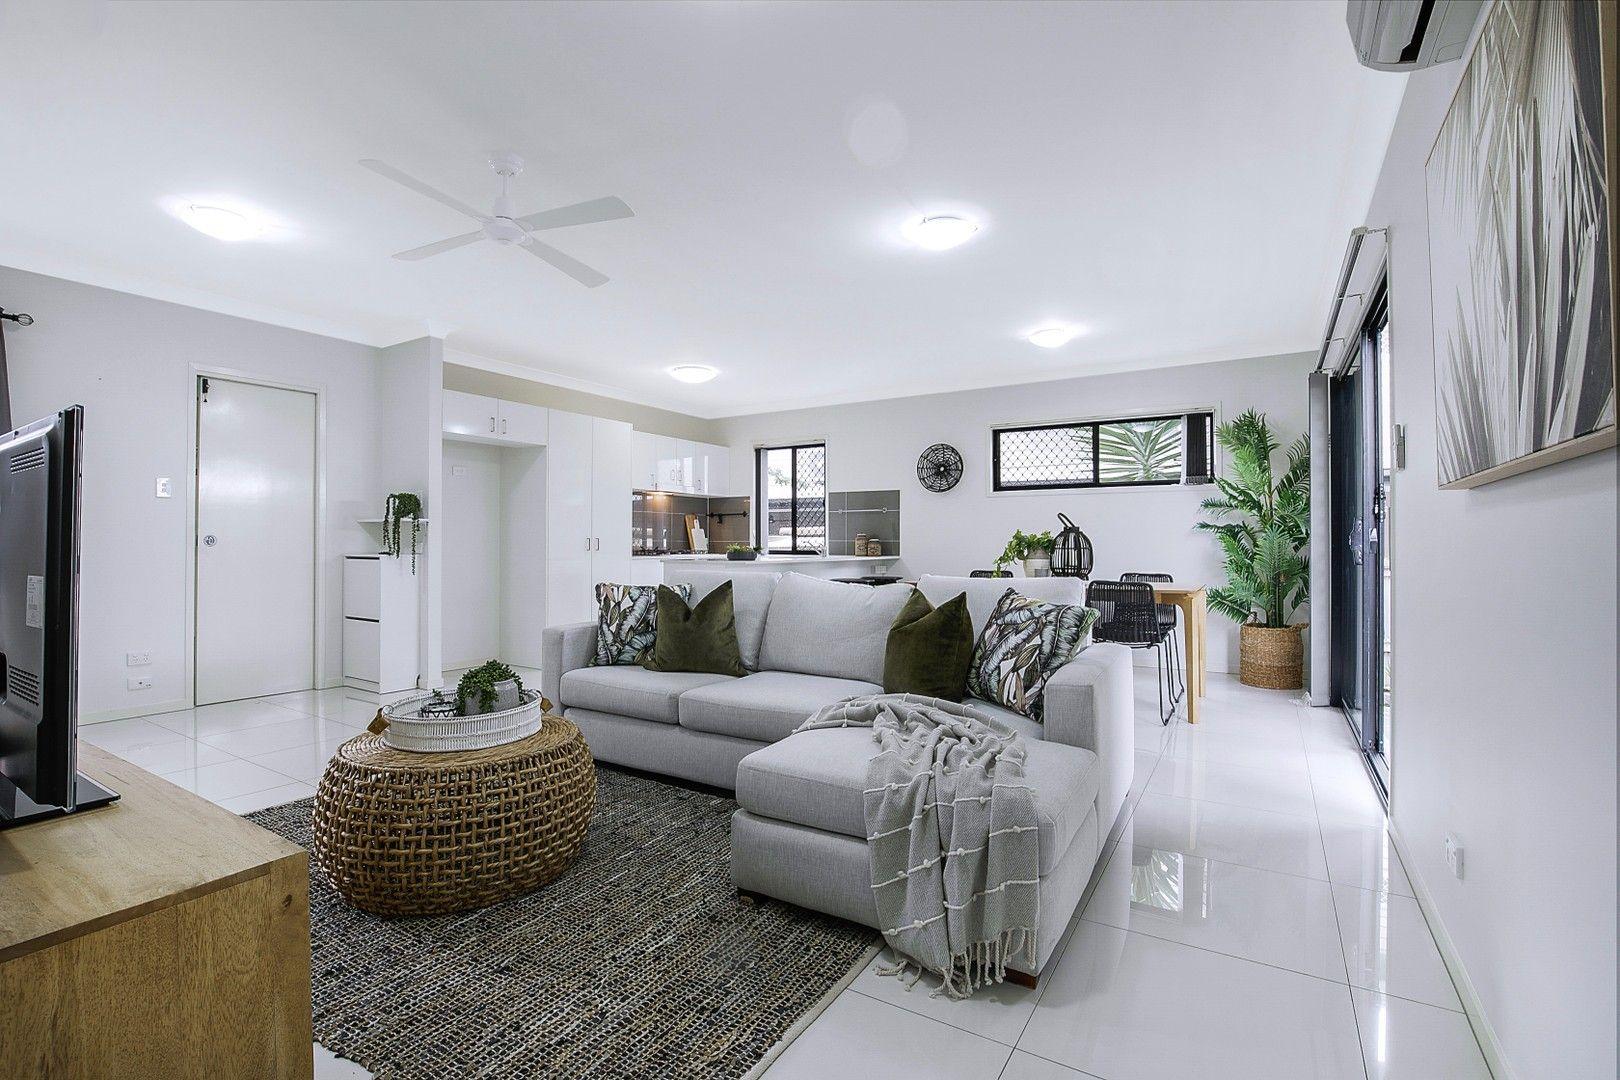 2/39 Dickenson Street, Carina QLD 4152, Image 0